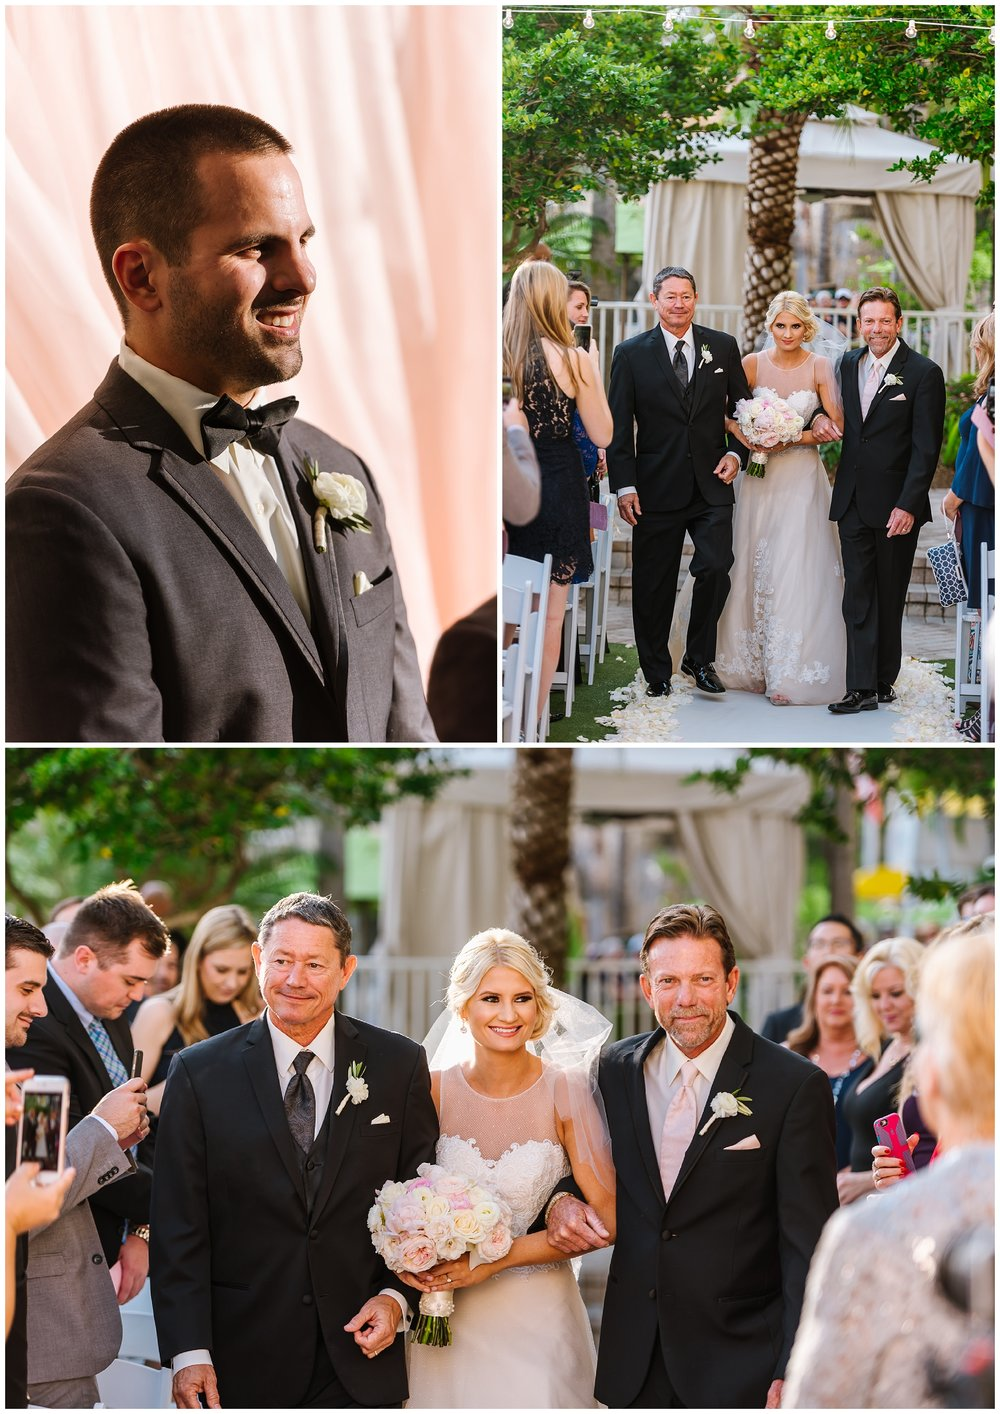 Sarasota-wedding-photographer-hyatt-regency-blush_0036.jpg